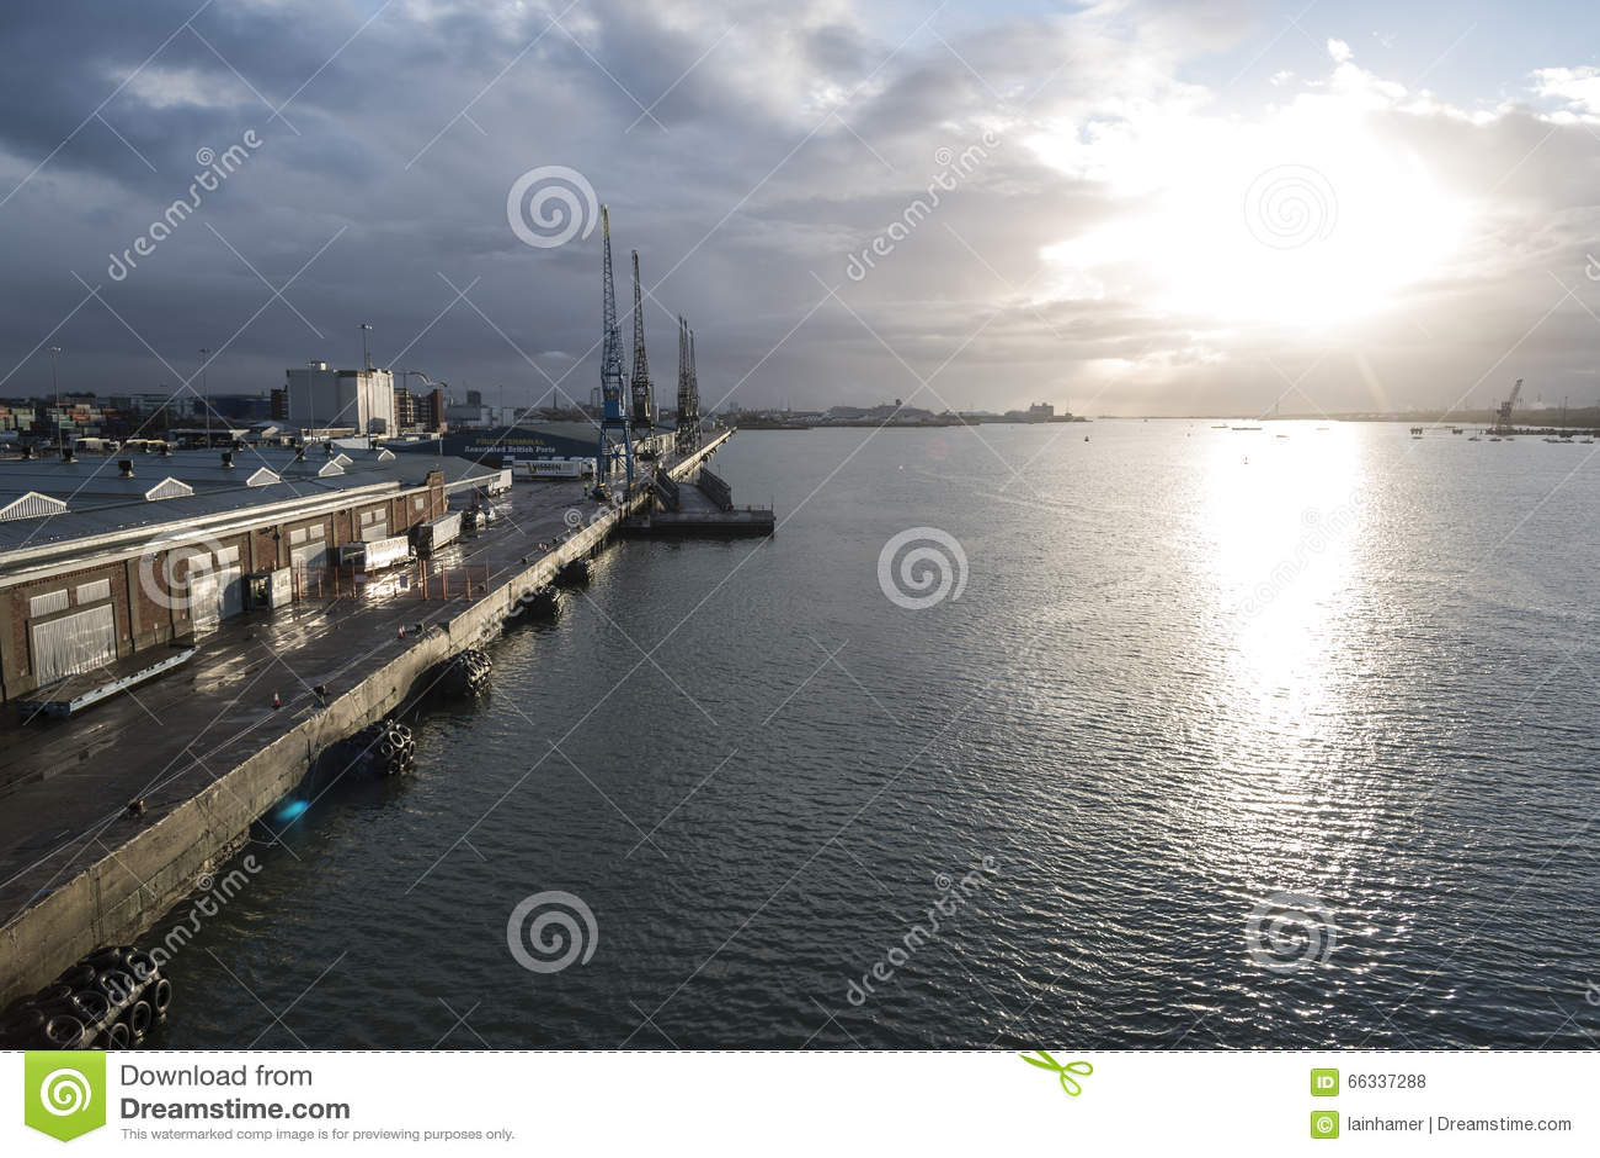 Southampton Docks United Kingdom